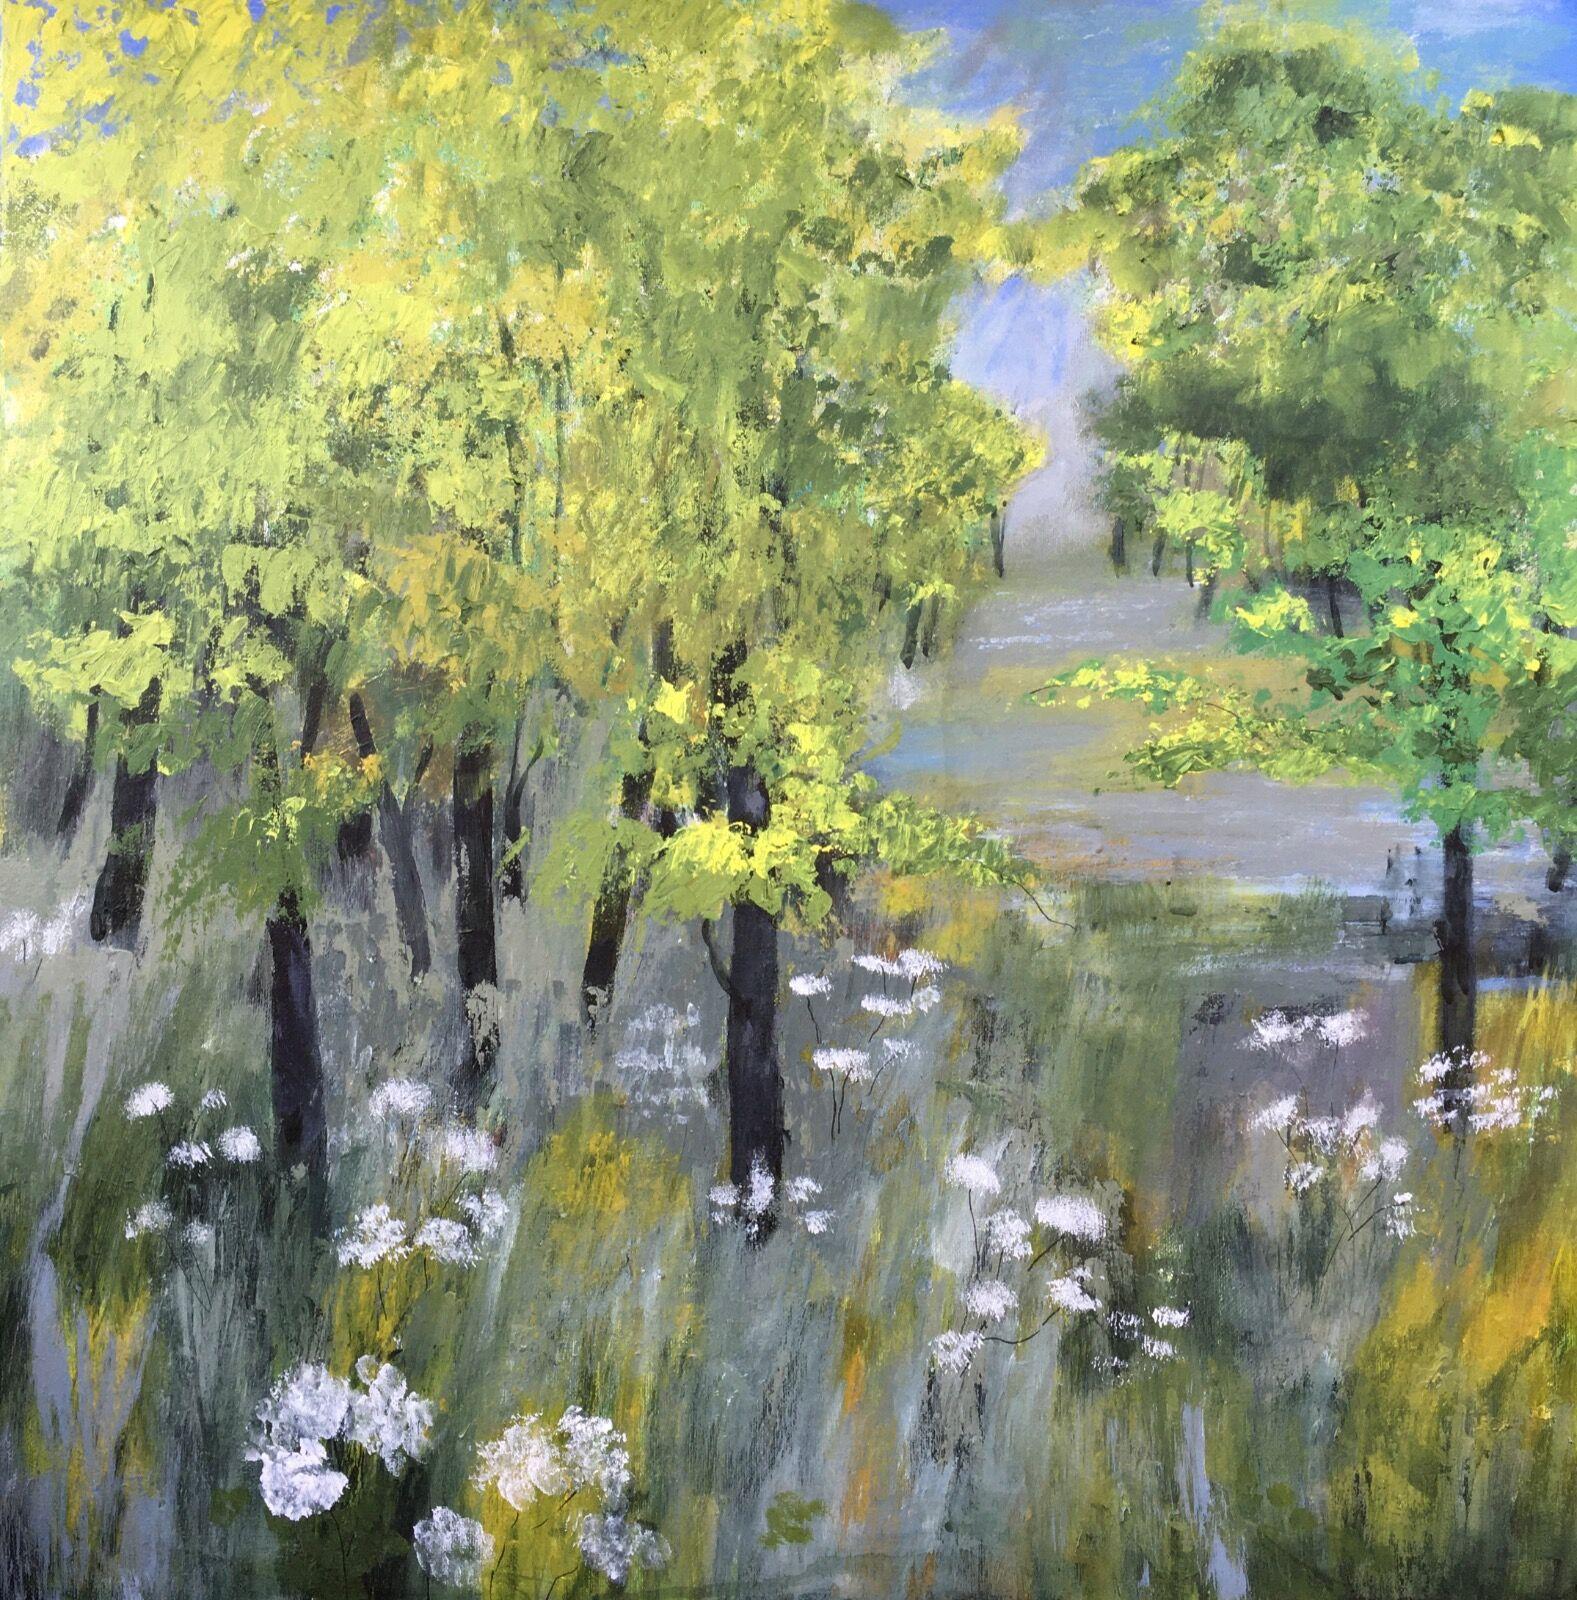 Spring wood painting